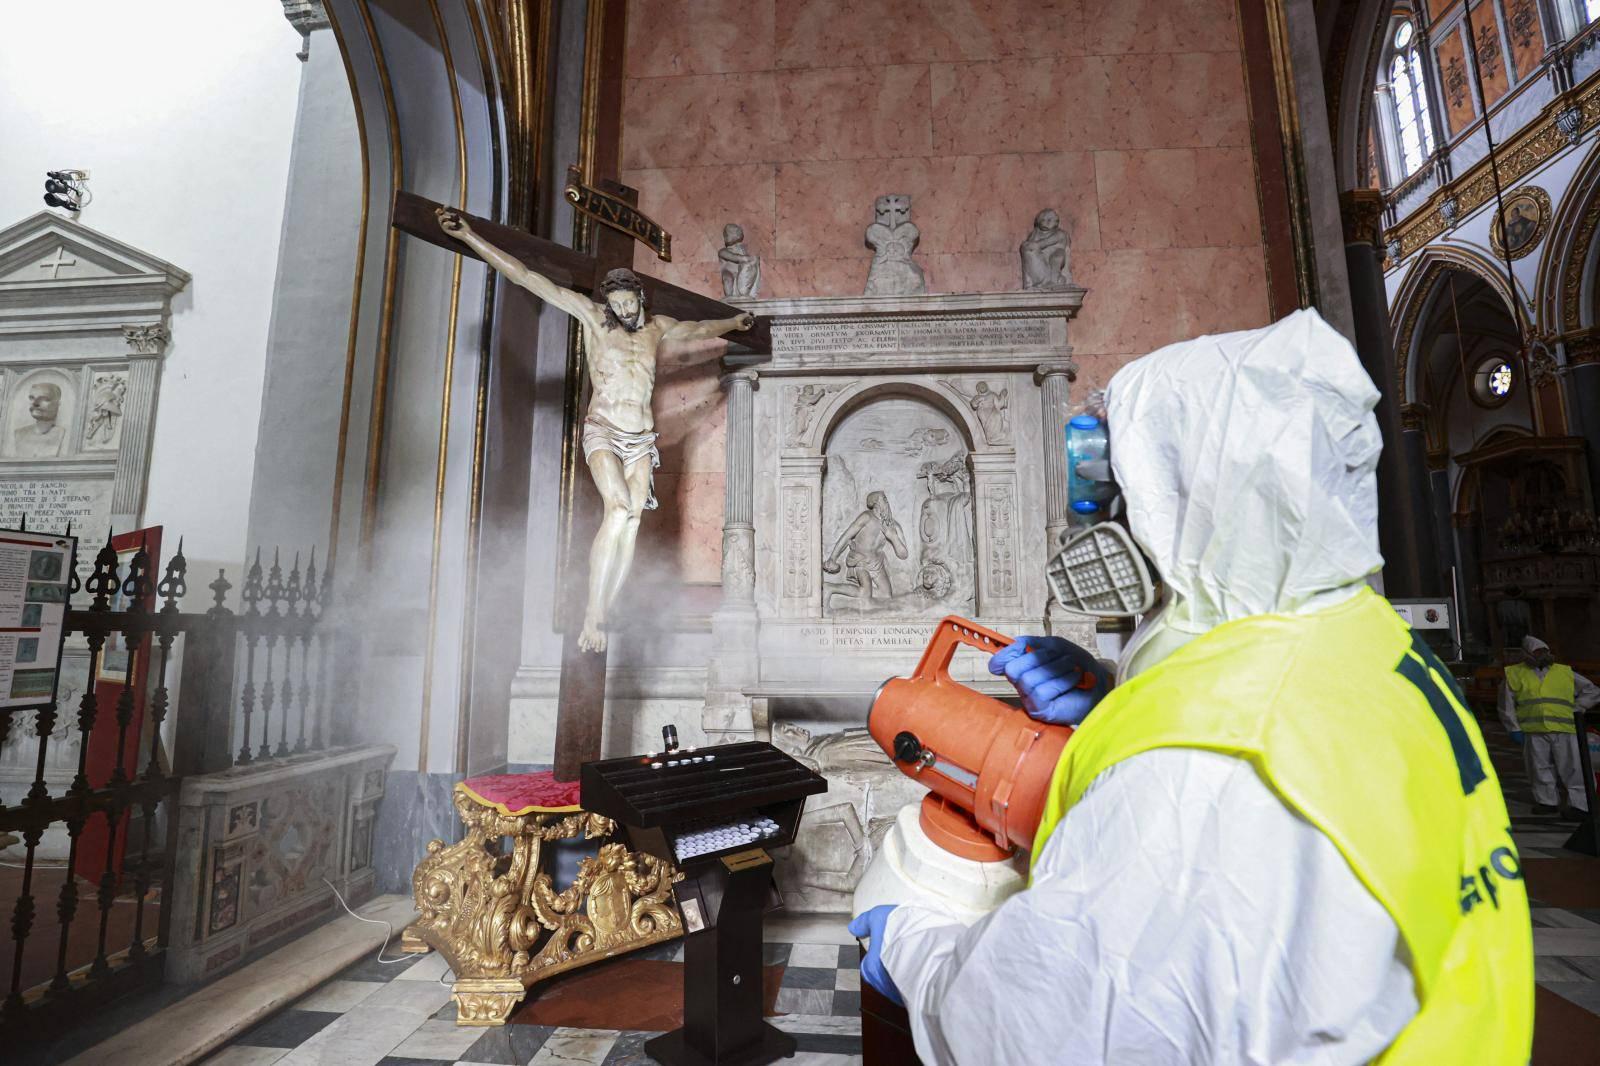 Coronavirus outbreak crisis in Naples